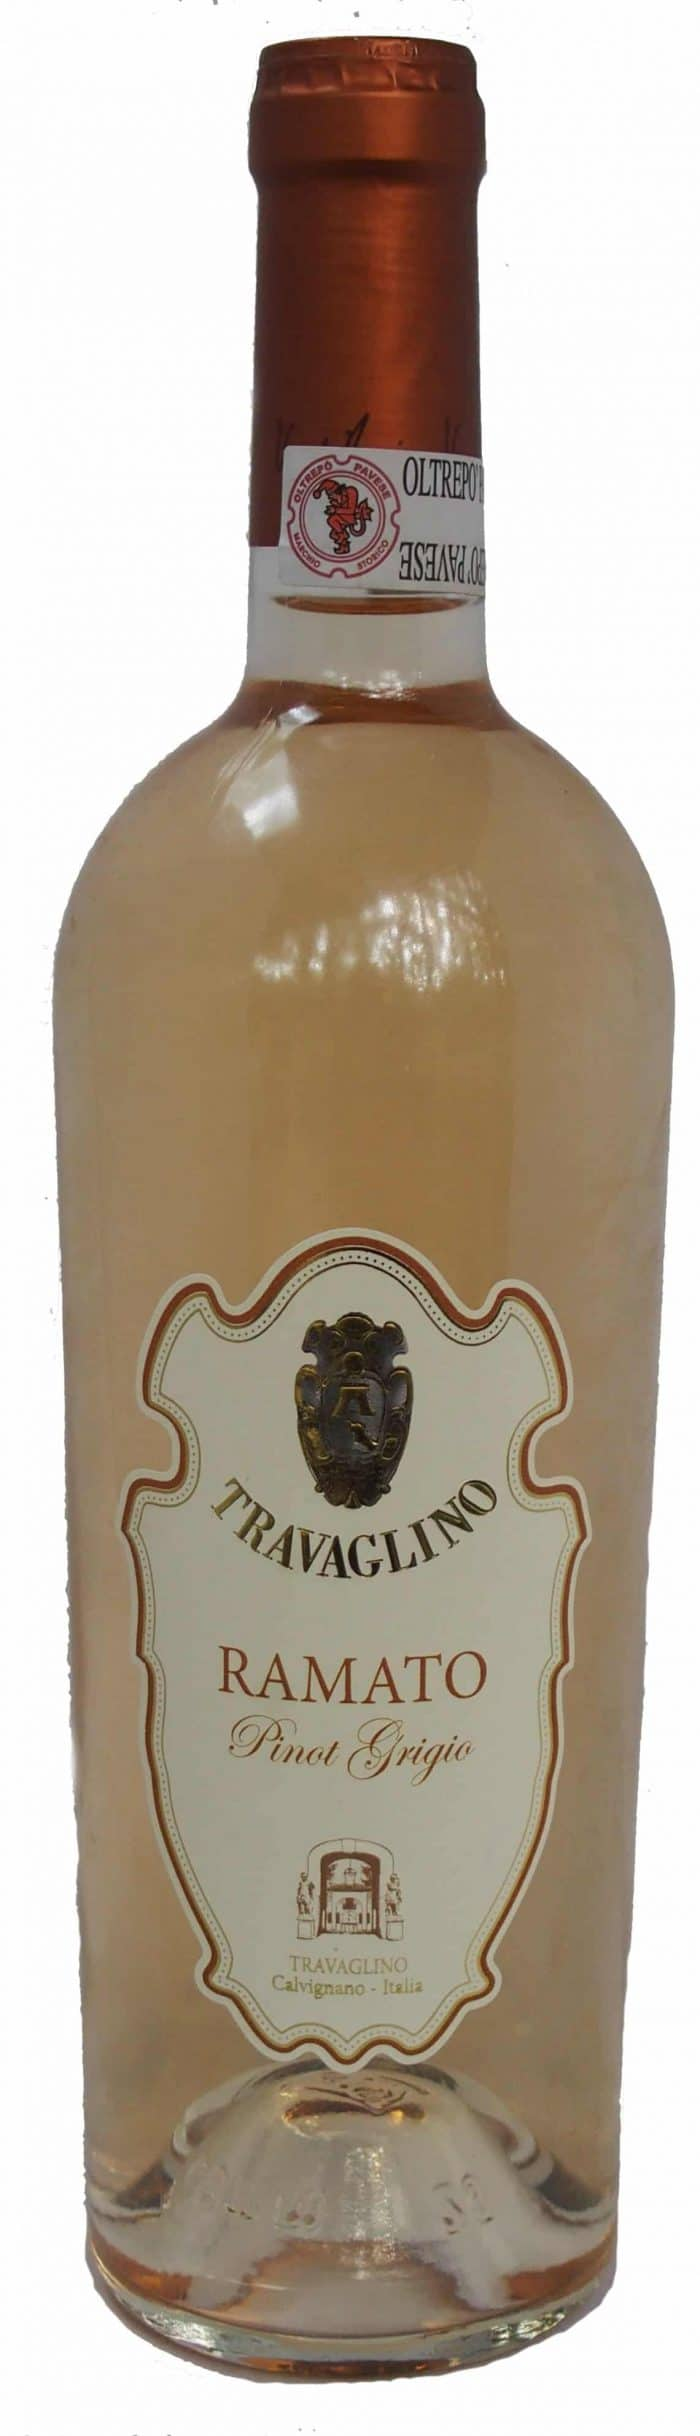 Travaglino Ramato   Italië   gemaakt van de druif: Pinot Grigio